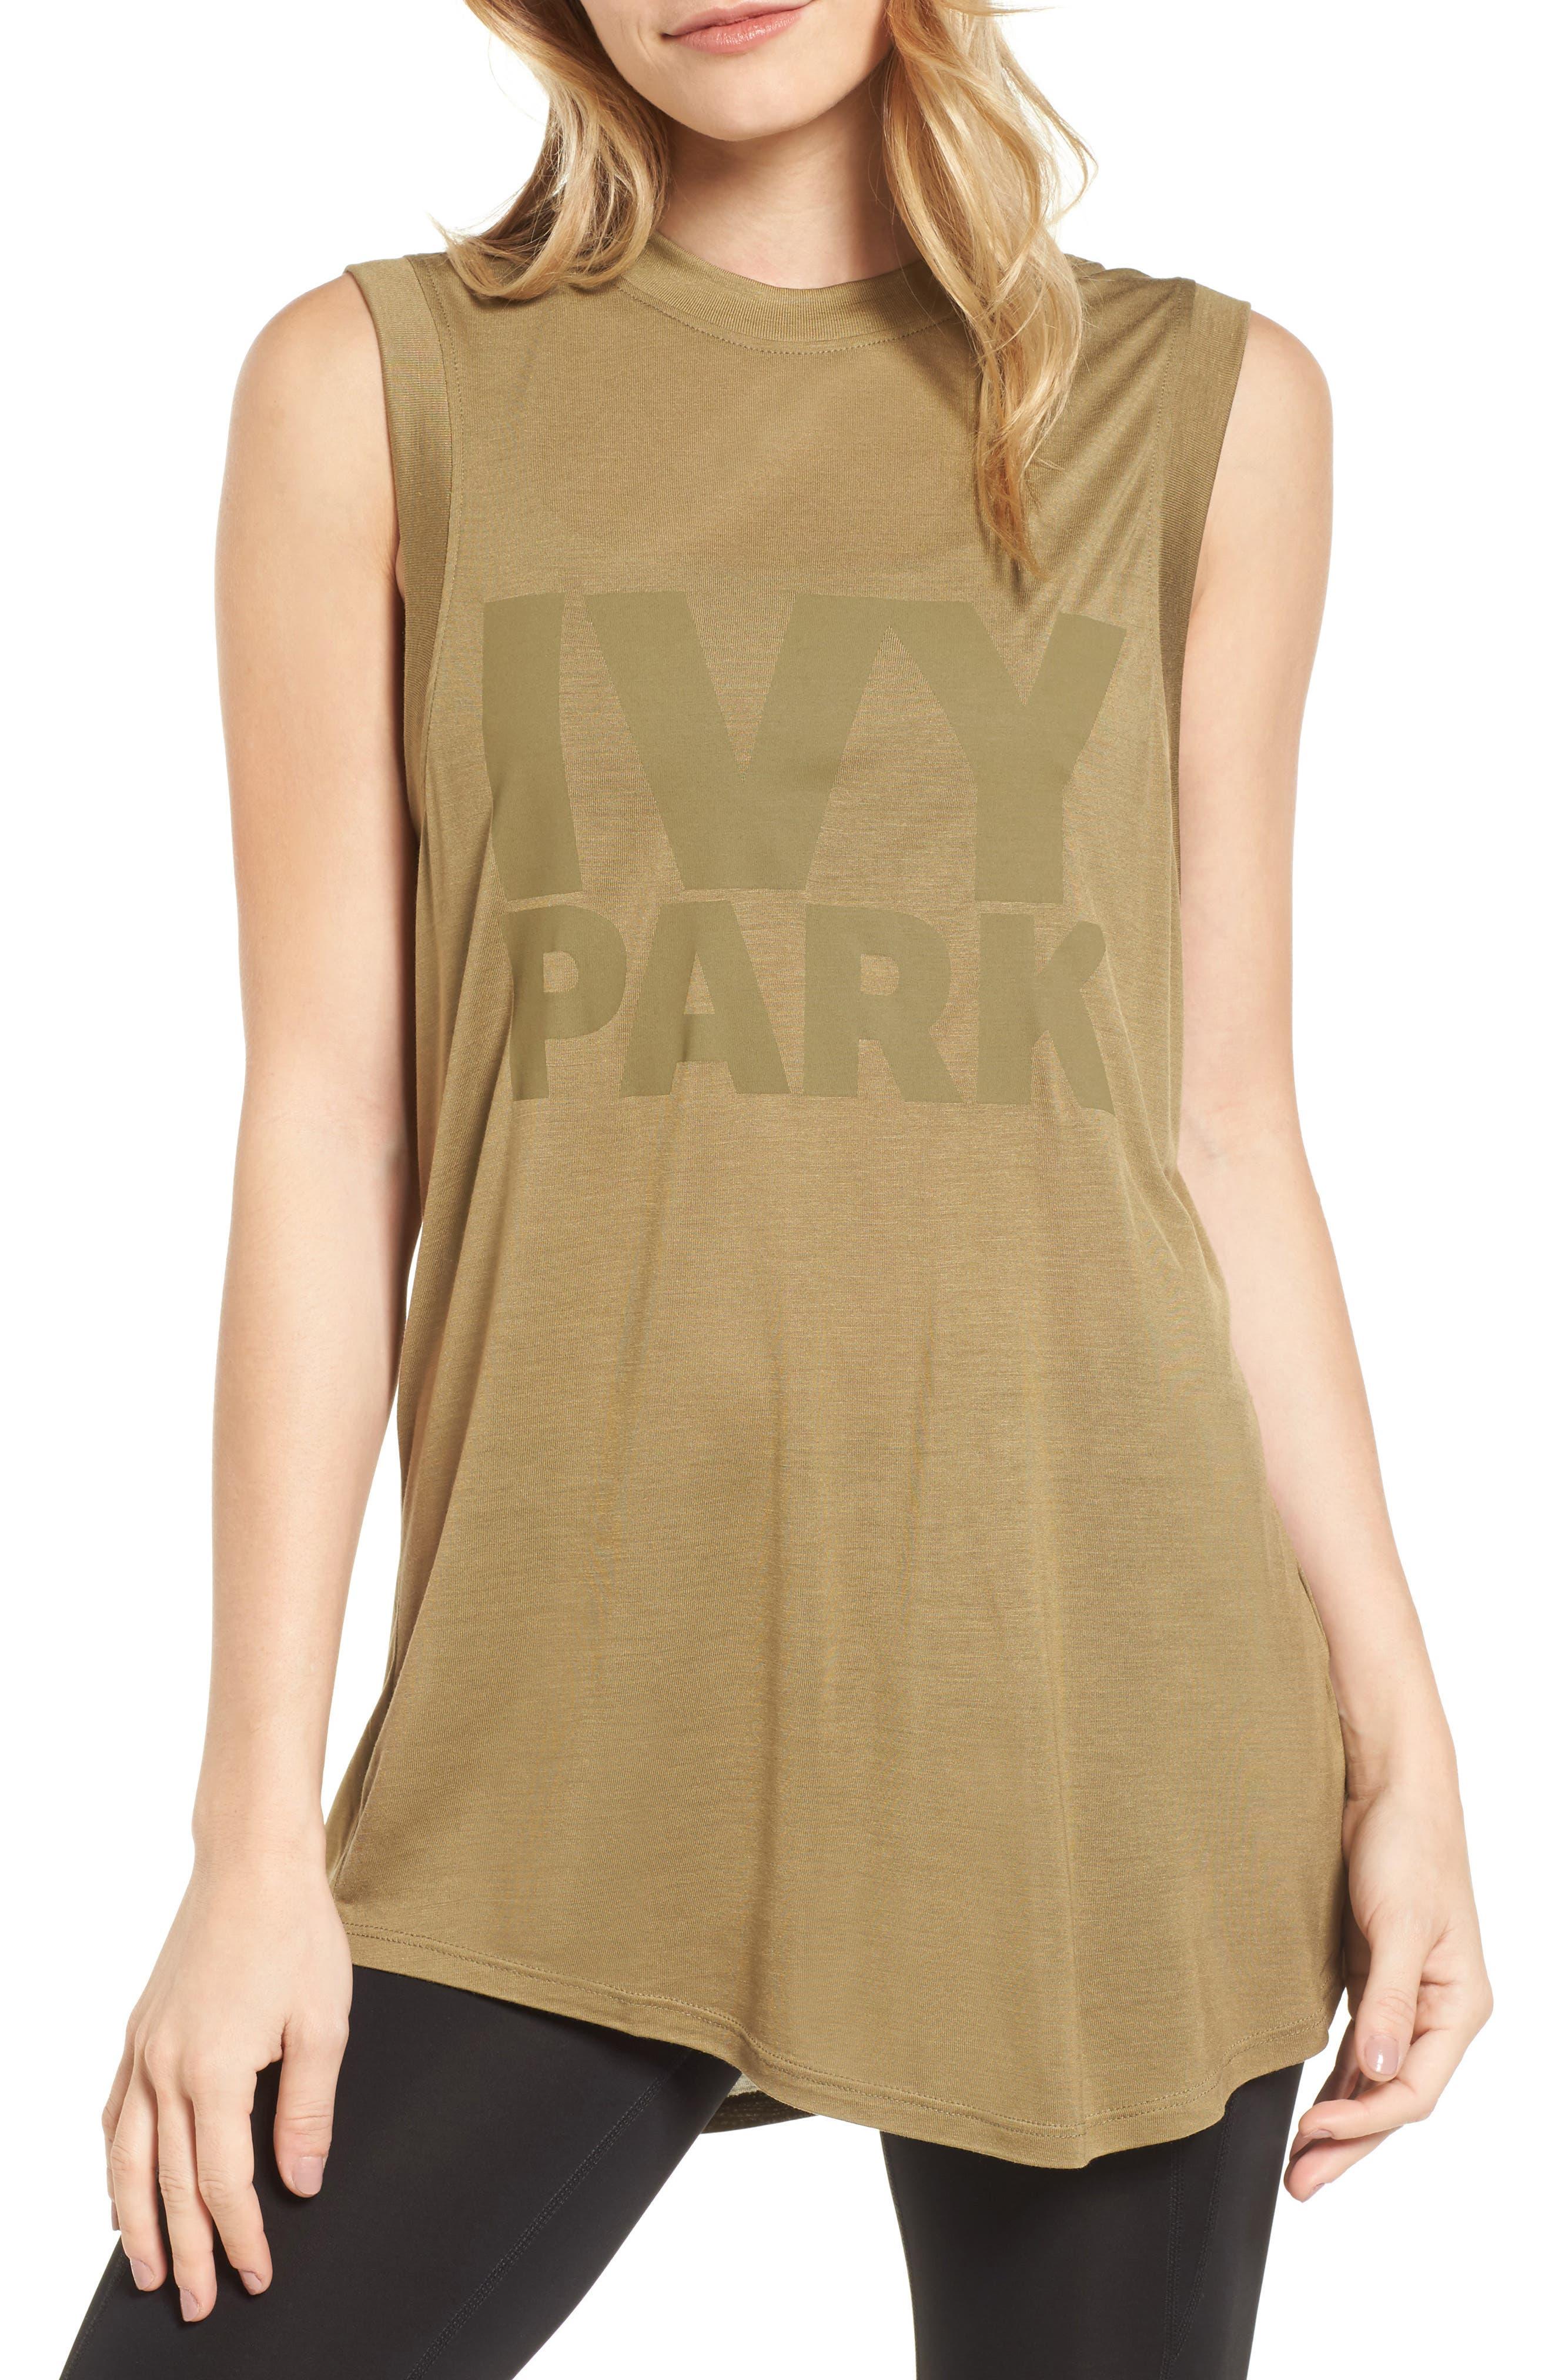 Ivy Park TONAL LOGO TANK